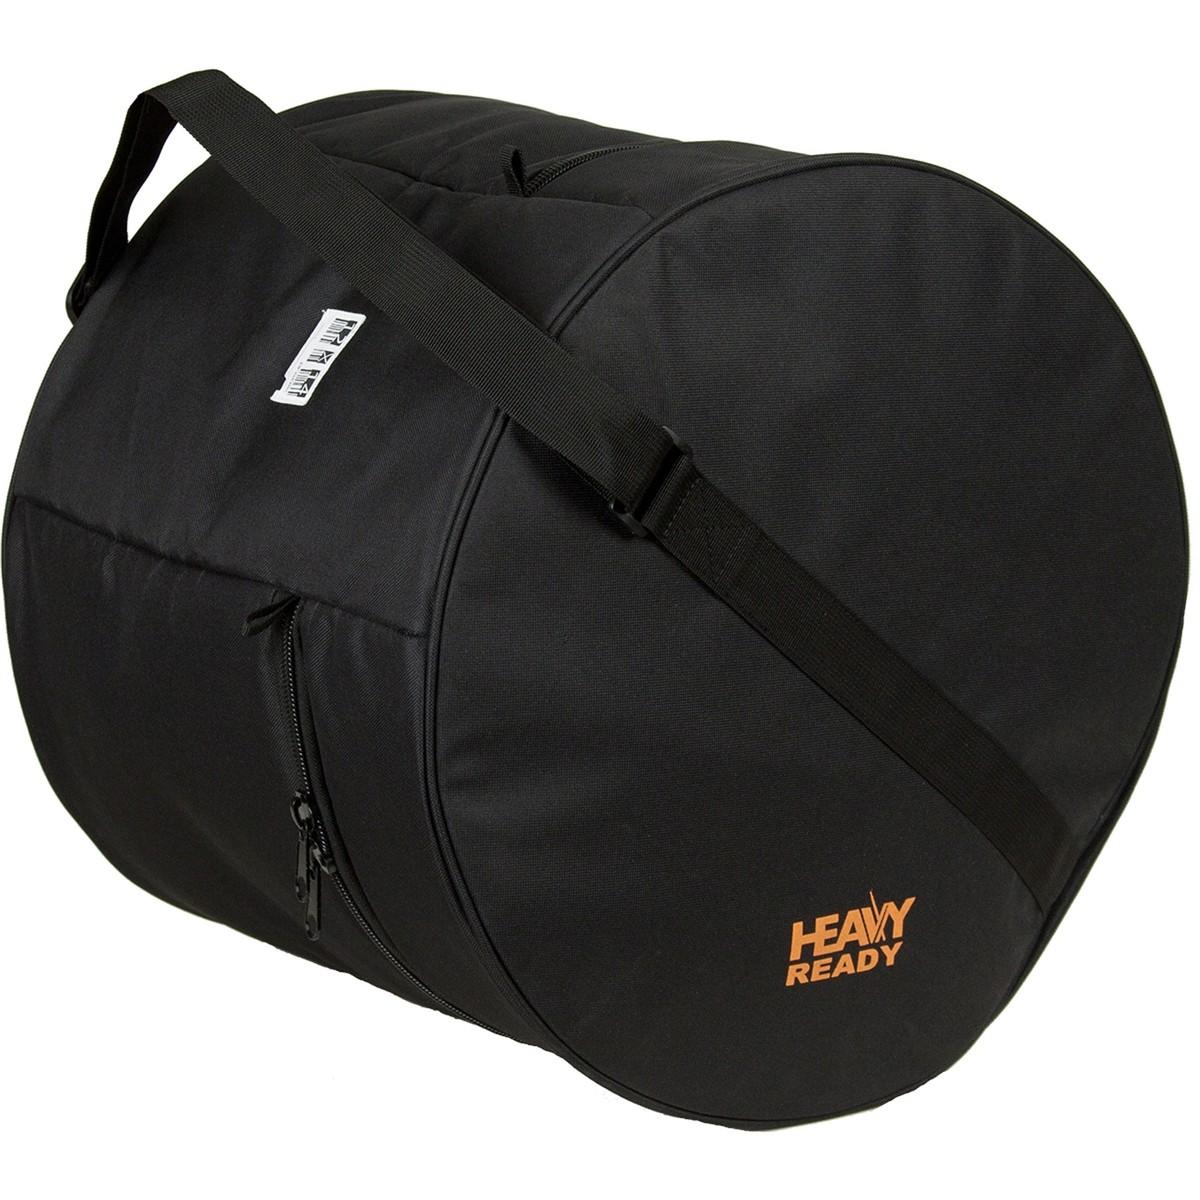 Protec Heavy Ready Series Padded Tom Bag 12″ X 14″ (HR1214)